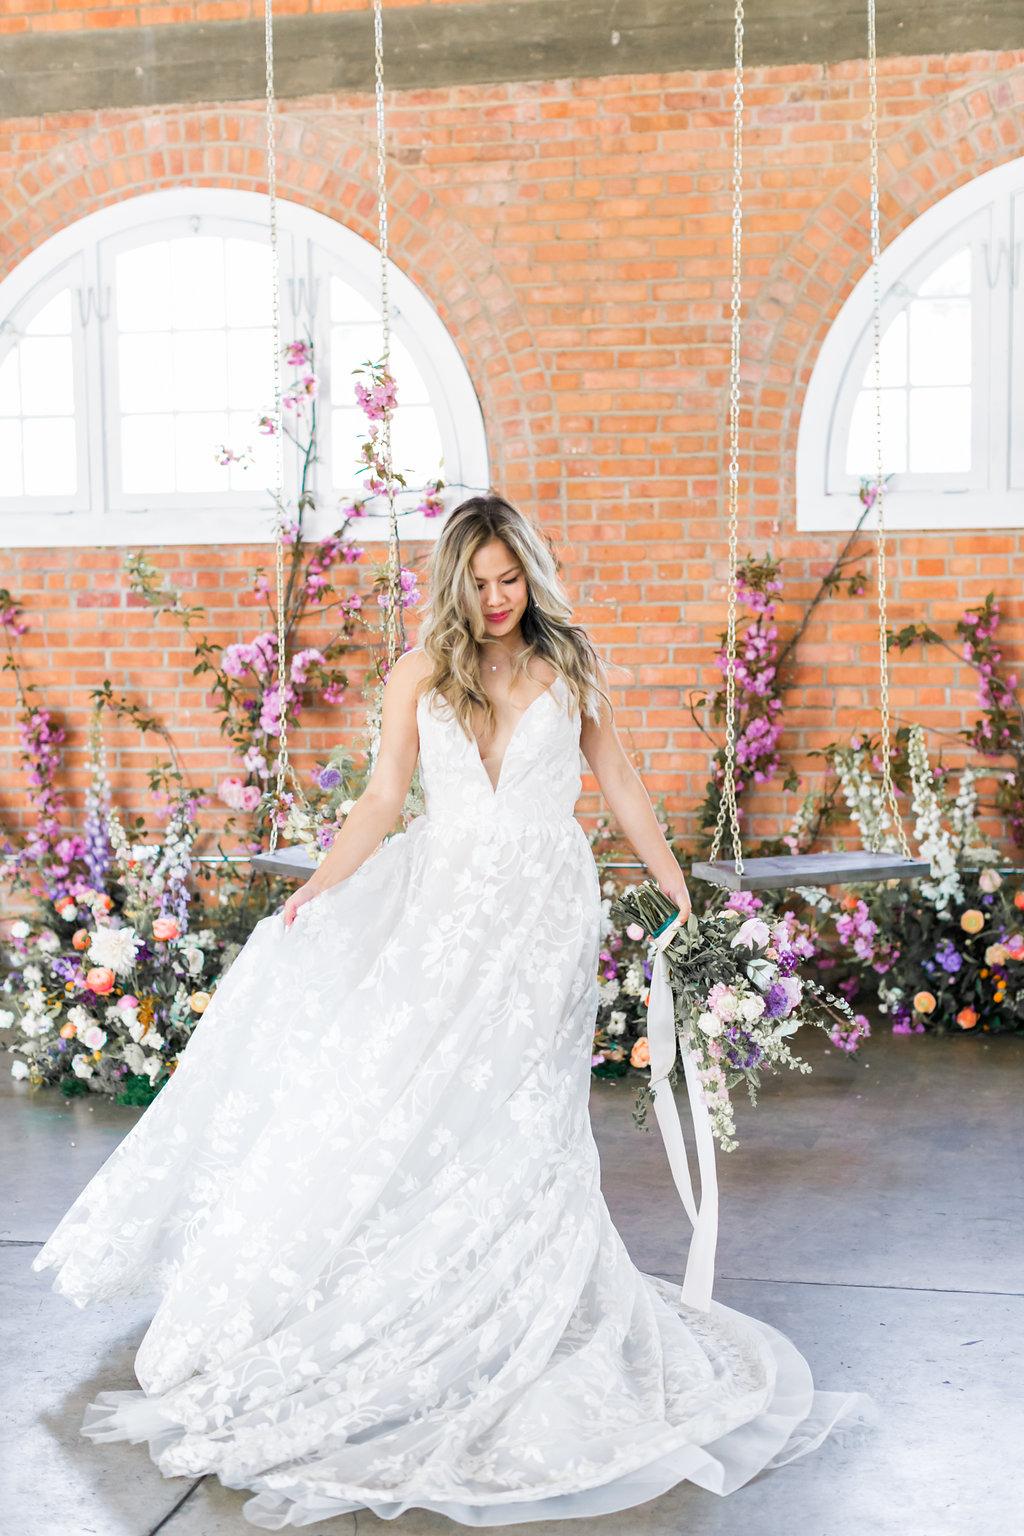 FloralBrickWeddingEditorial-NatalieSchuttPhotography-242.JPG